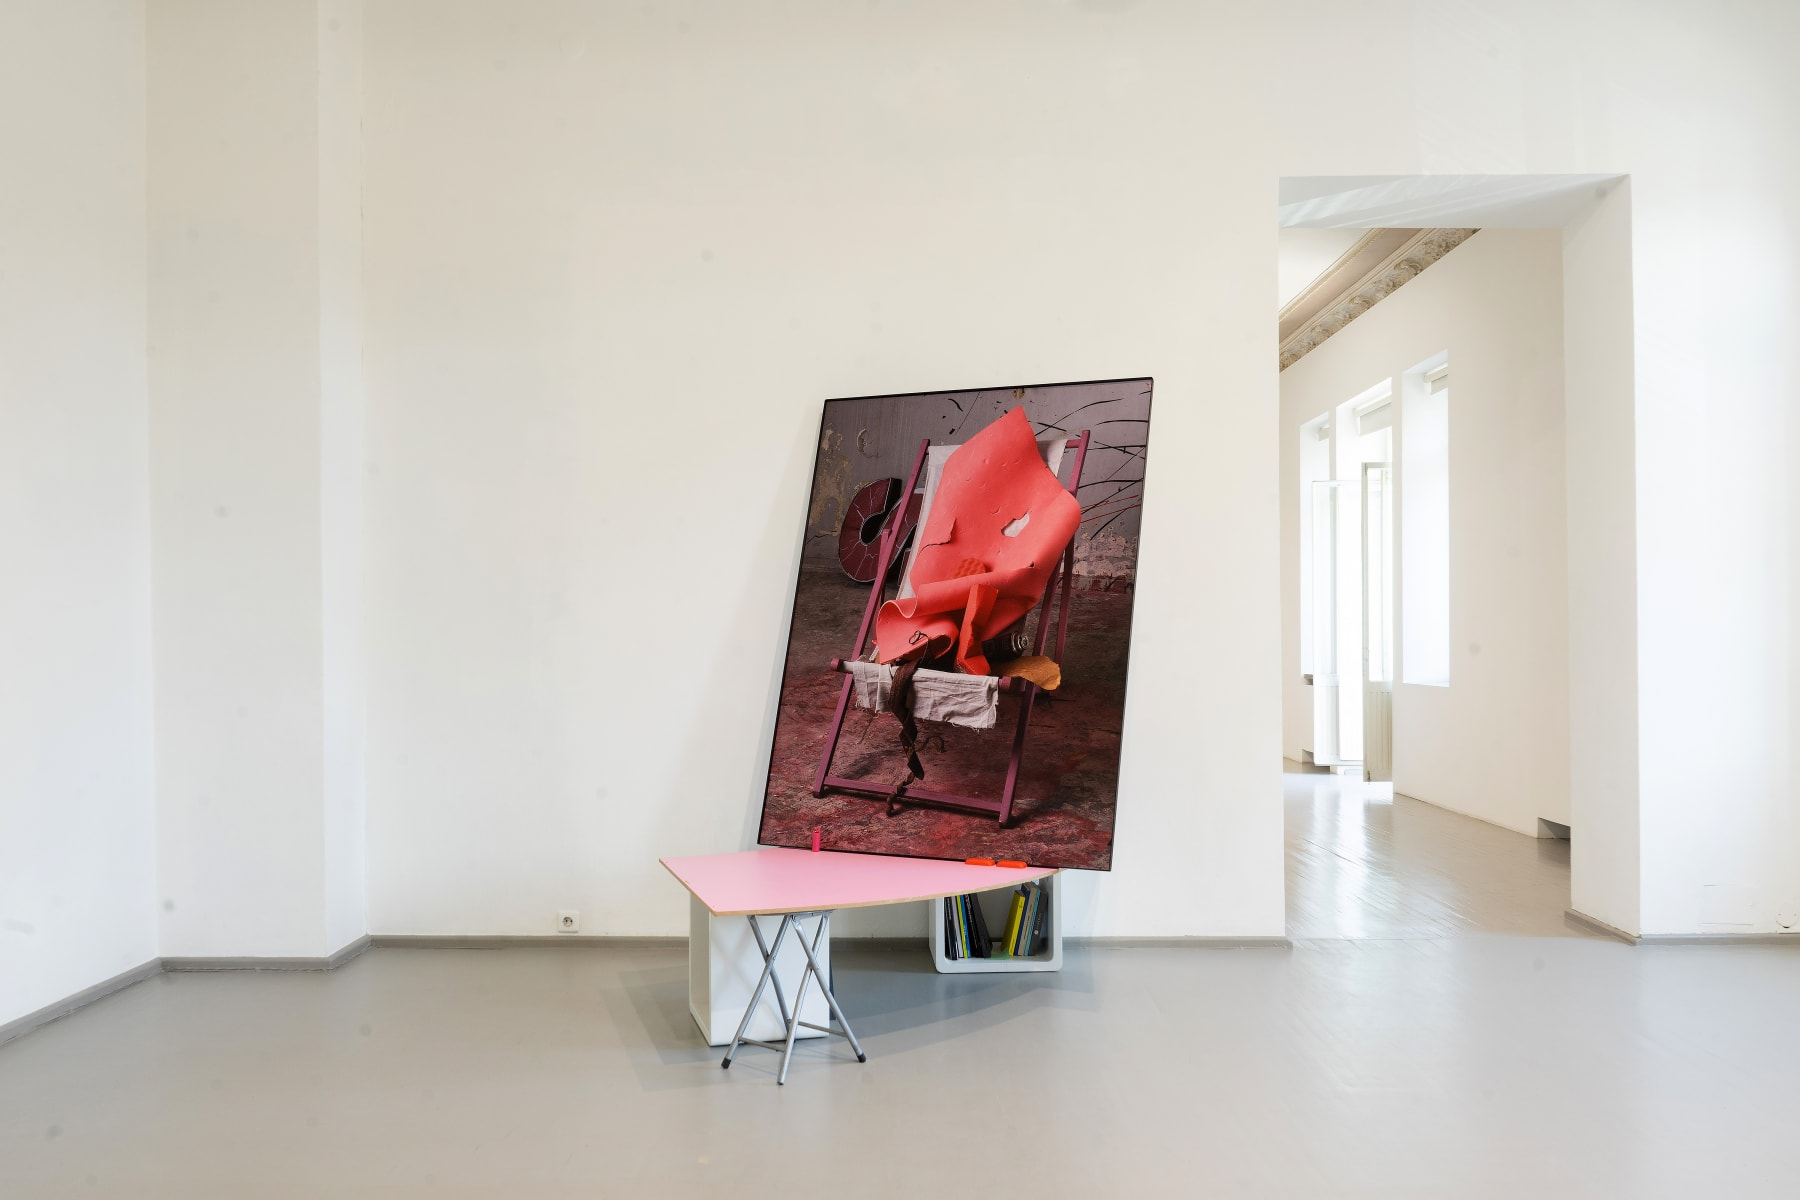 Galerija Vartai, 2020 Installation shot from Robertas Narkus's solo exhibtion